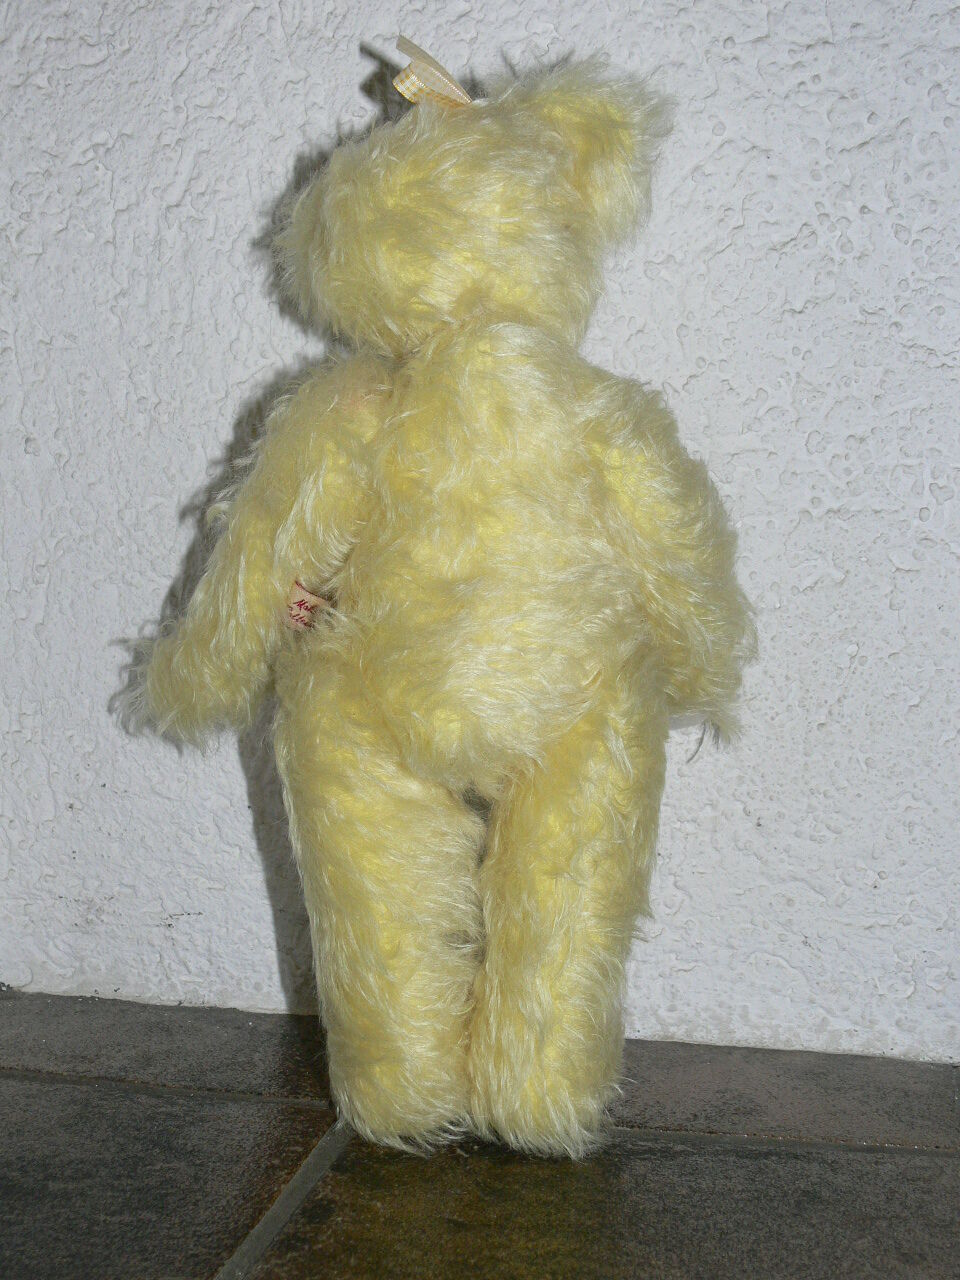 grauly - - - Bär Sarah - gelb - ca. 35 cm - limitiert -  Nr. 401 von 999 - a7c01a